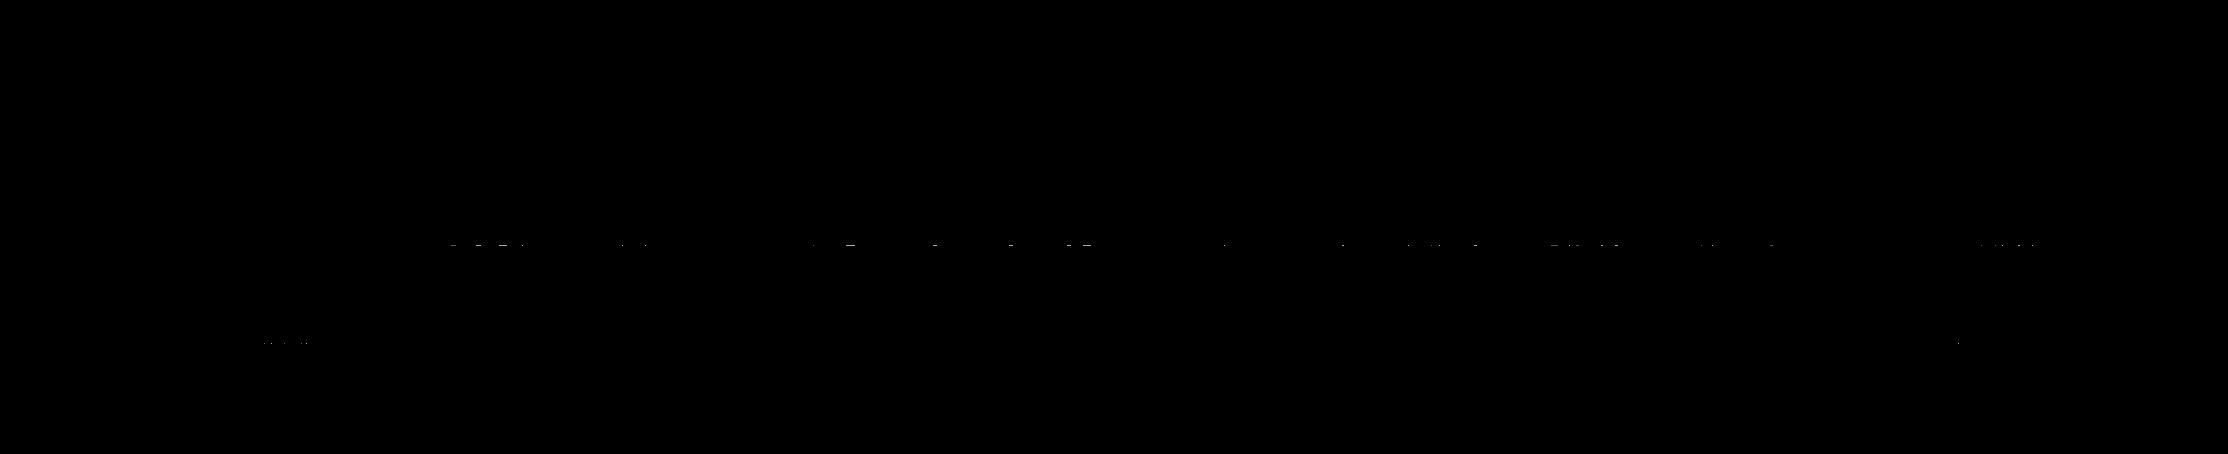 Crow River Sno Pro's logo